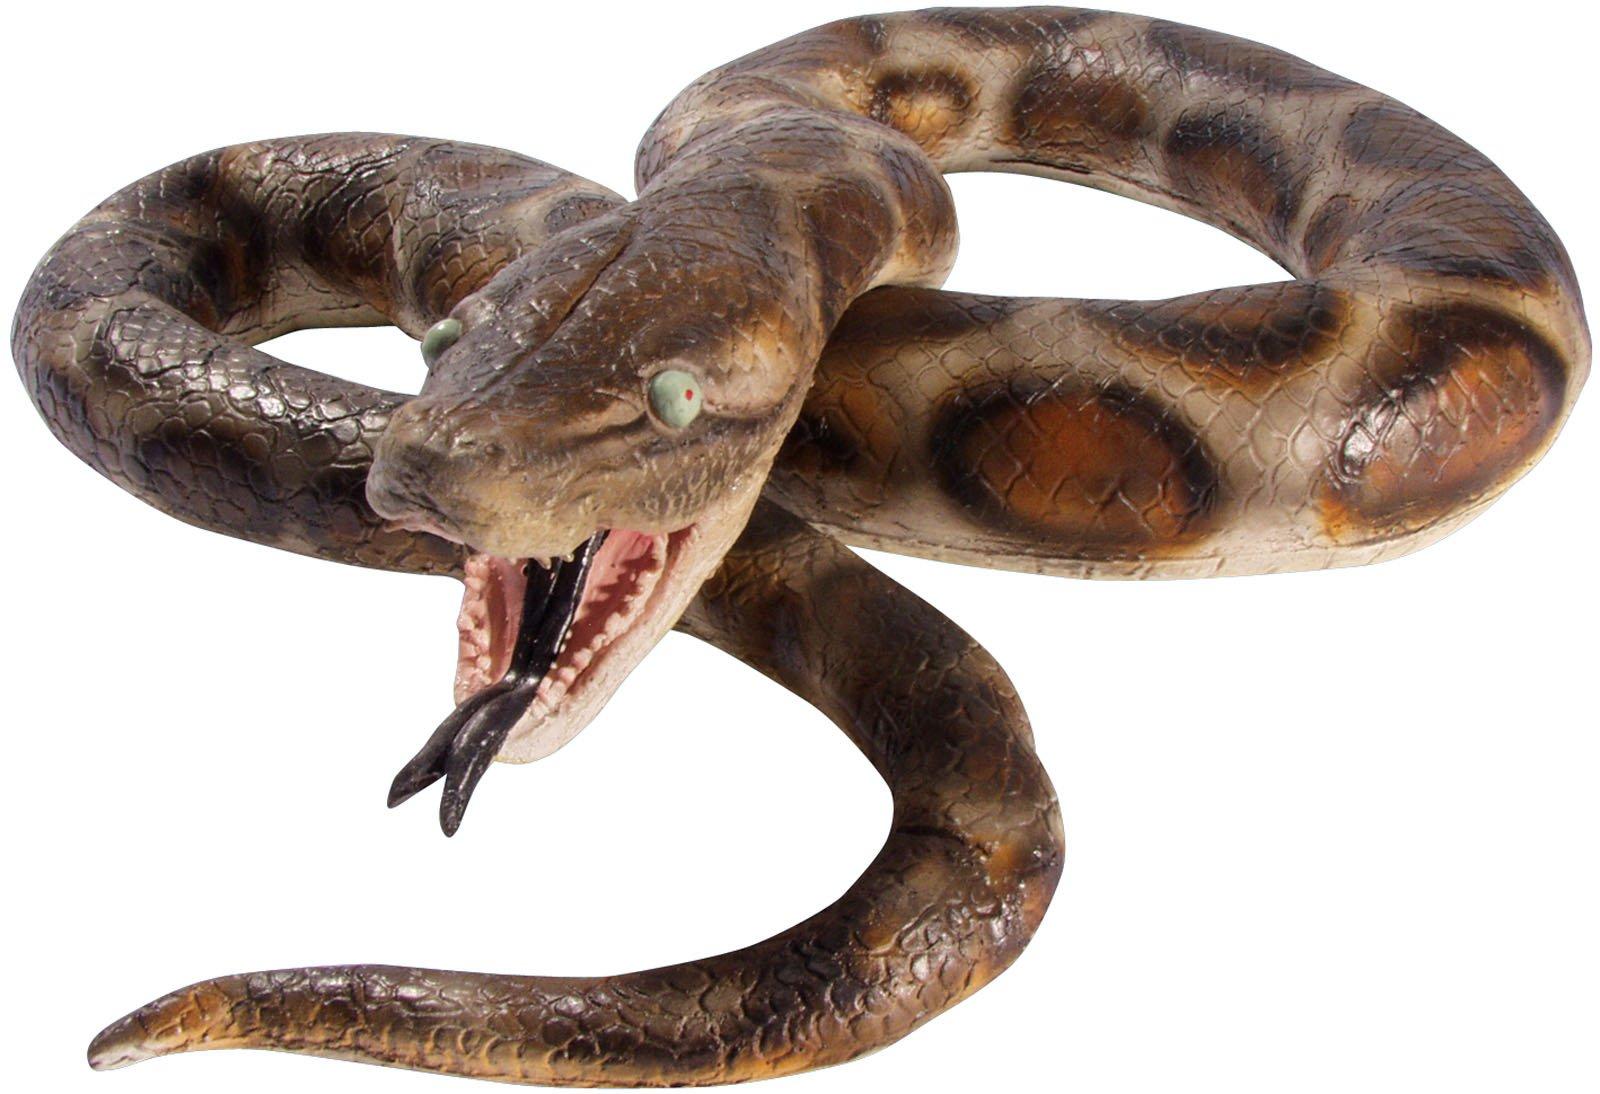 Loftus International Huge Realistic Giant Python 72'' Decoration Prop Brown Novelty Item by Loftus International